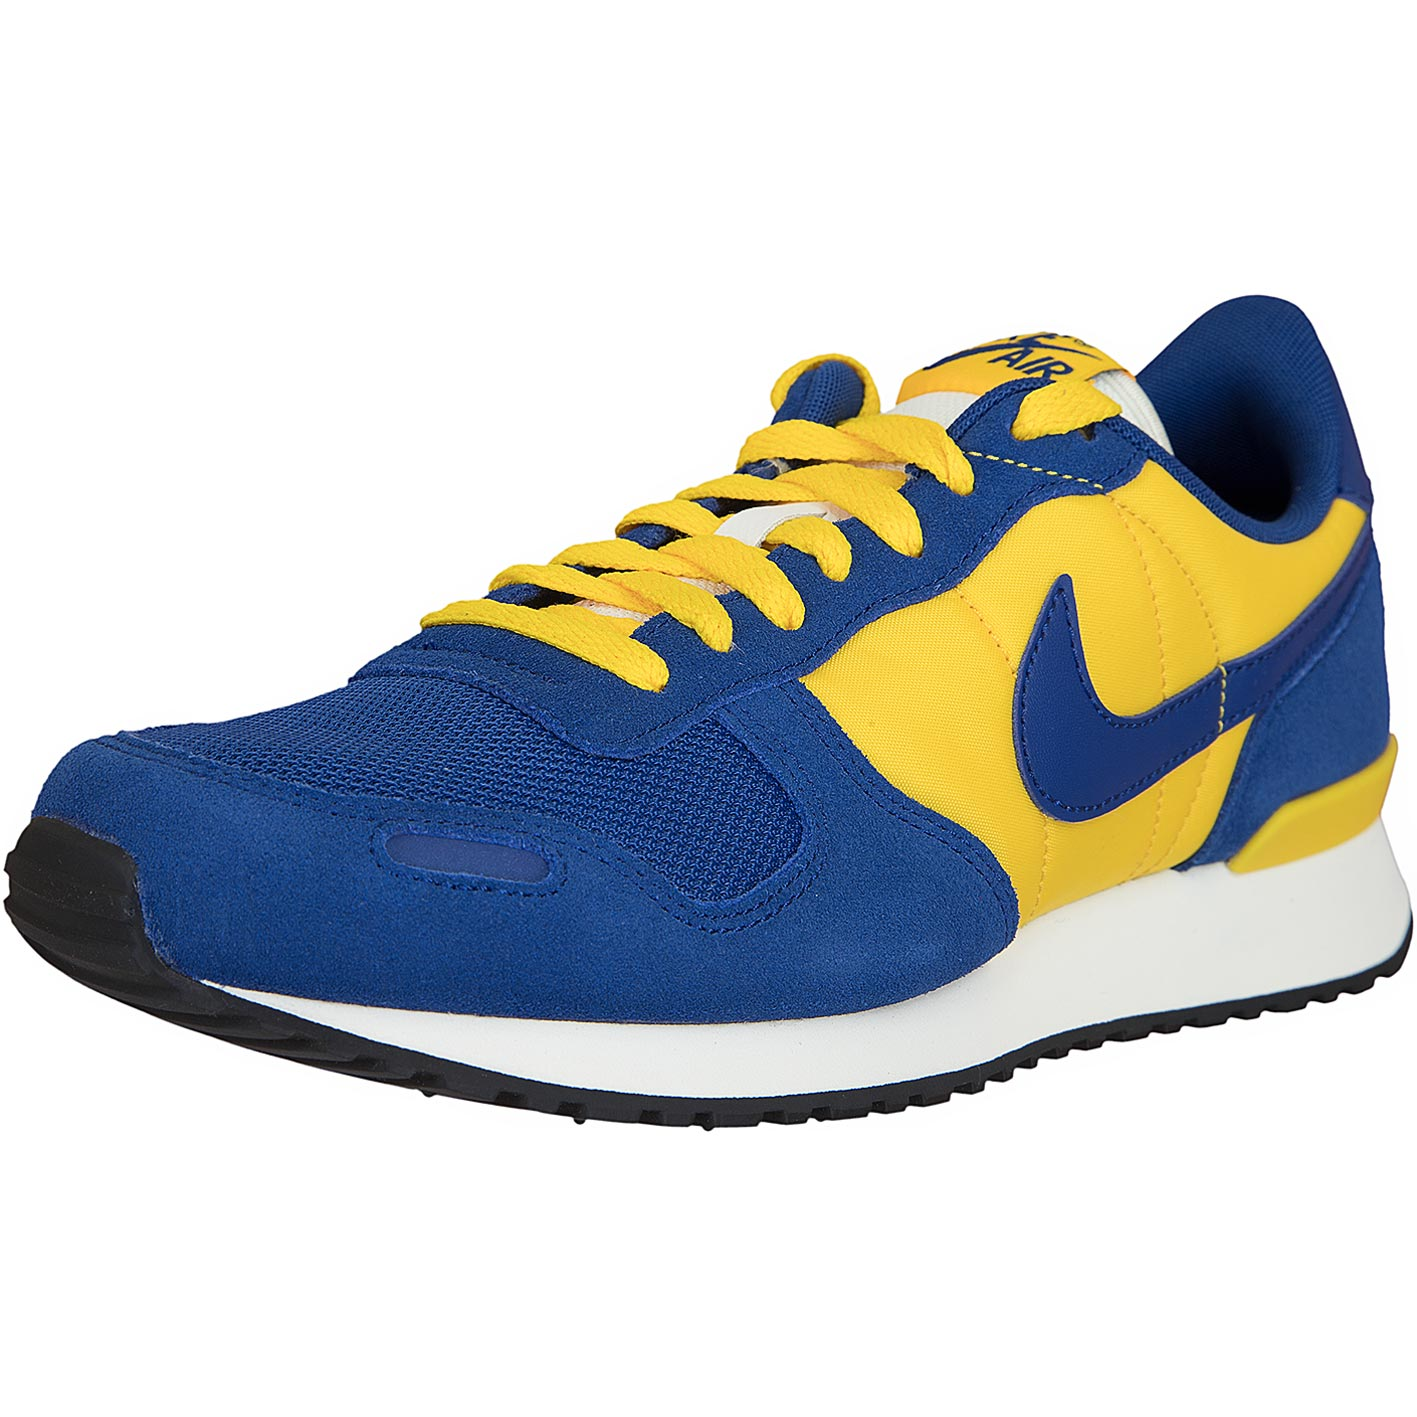 78d6be6cfe77bf ☆ Nike Sneaker Air Vortex blau gelb - hier bestellen!